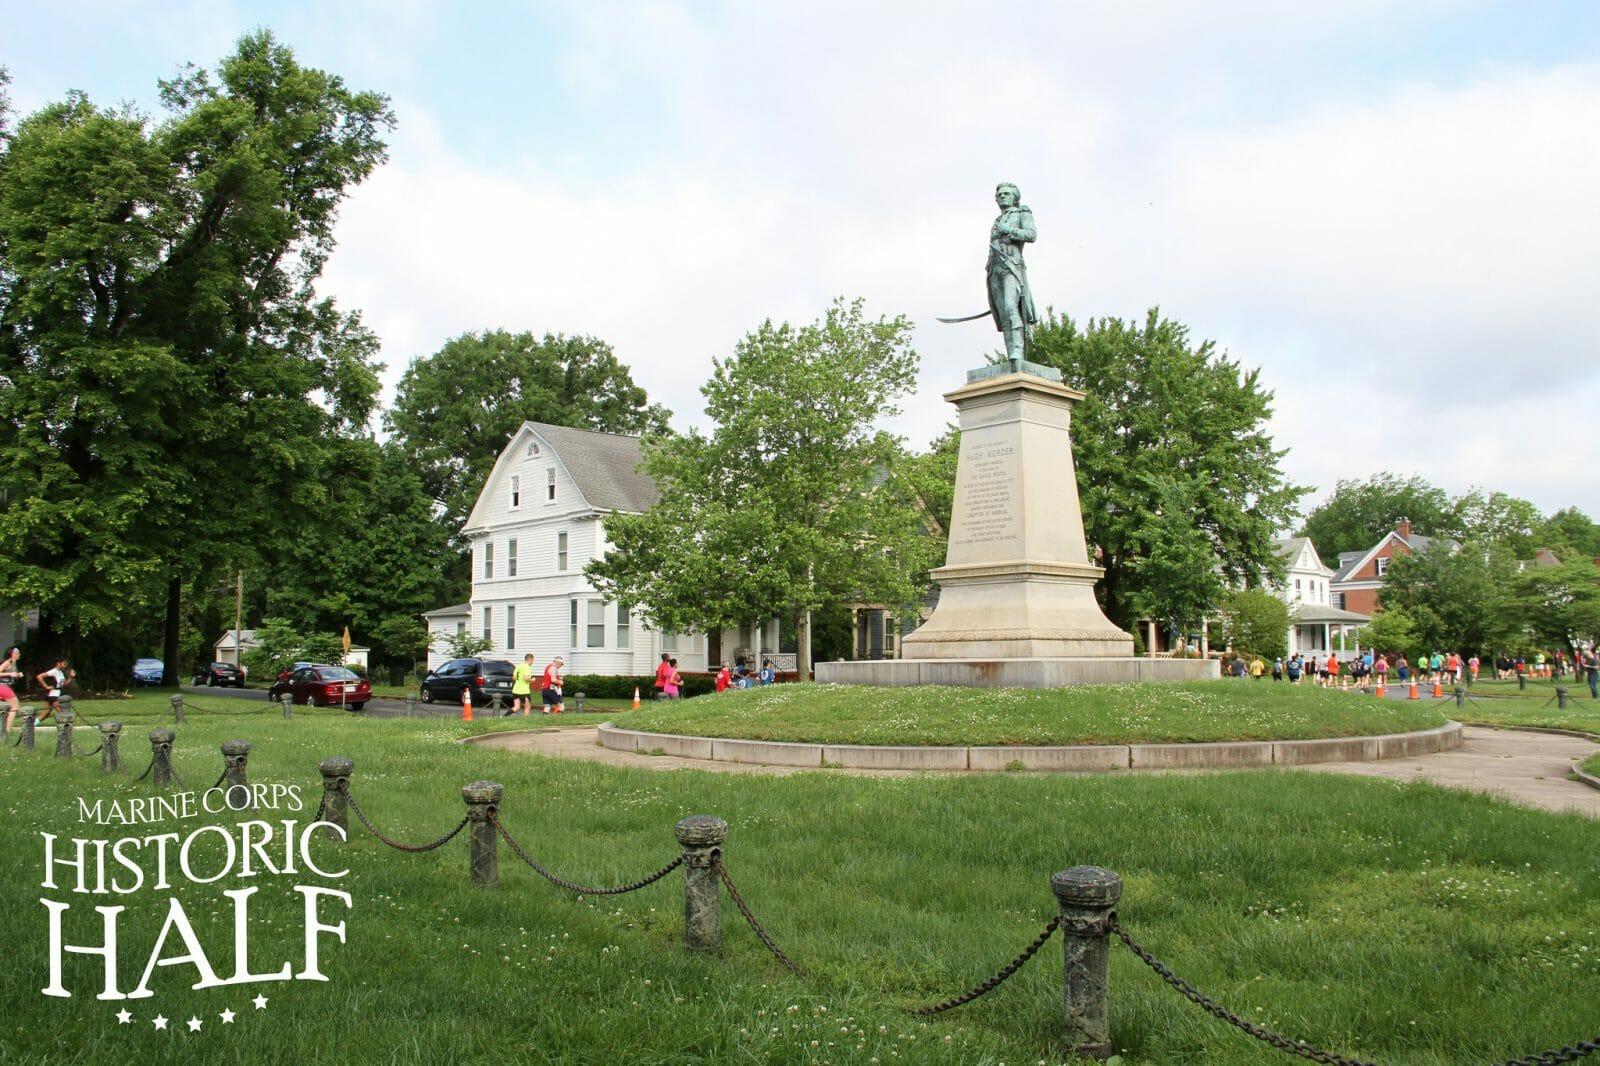 historic half sites